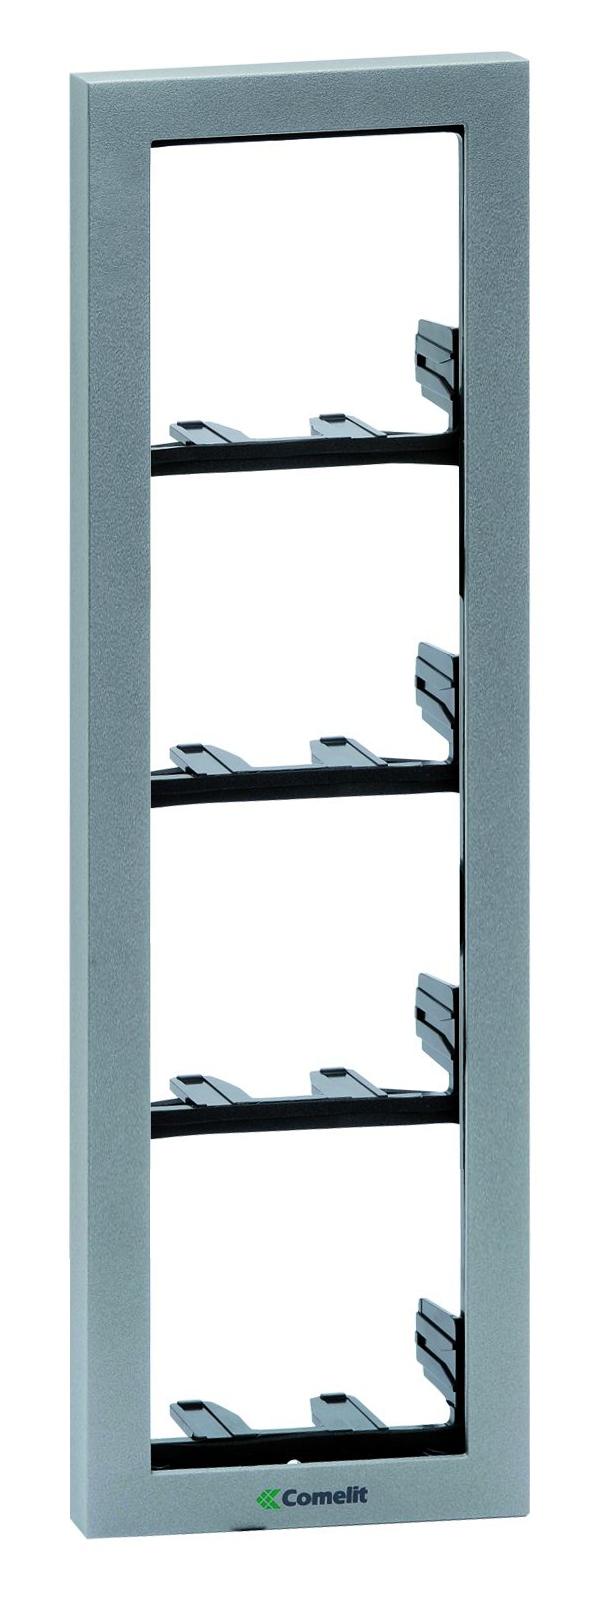 1 Stk Modulrahmen 4-fach silber SP331104S-